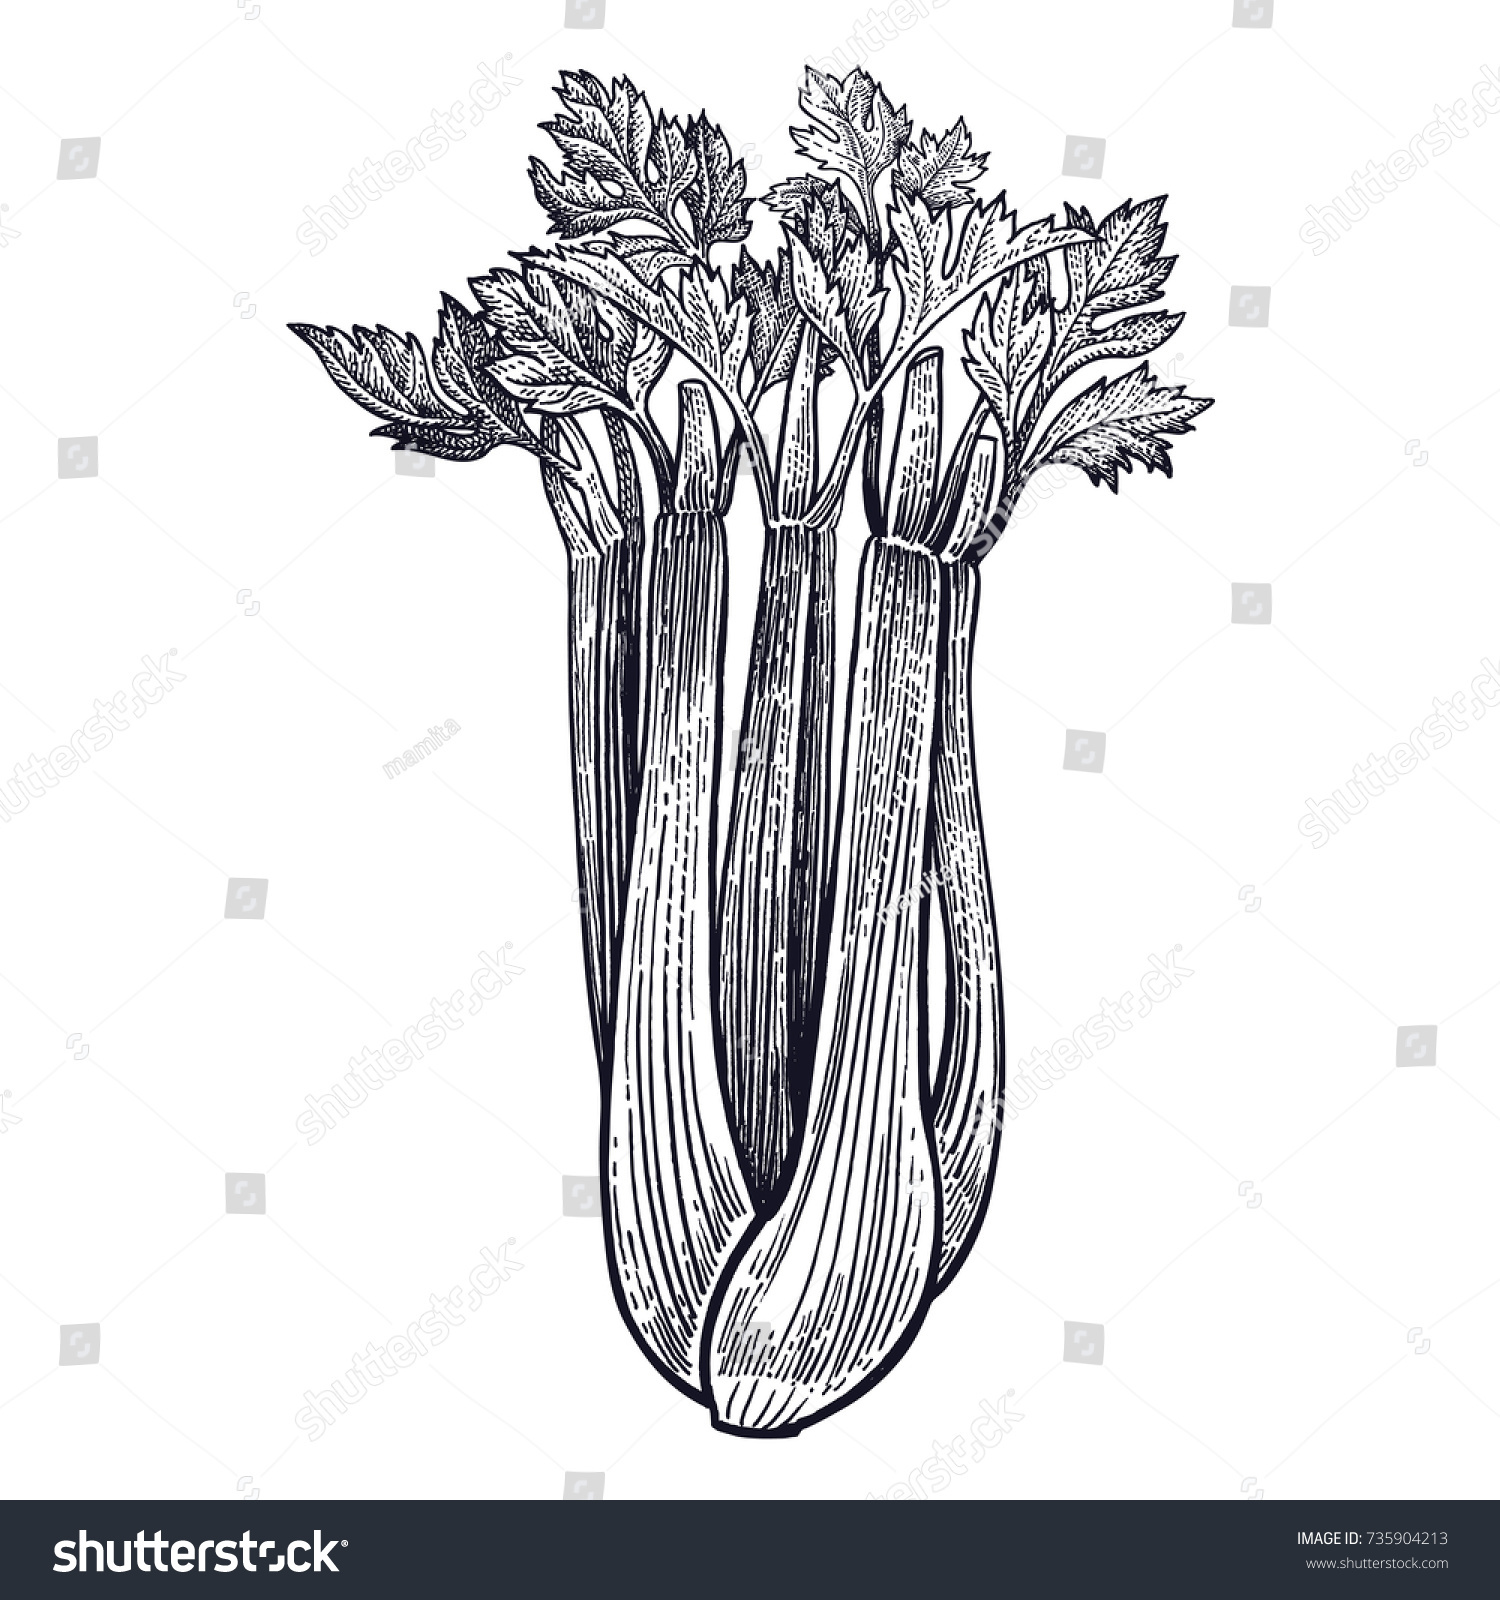 Celery plant isolated vegetarian food design vectores en stock vegetarian food for design menu recipes decoration kitchen items forumfinder Choice Image